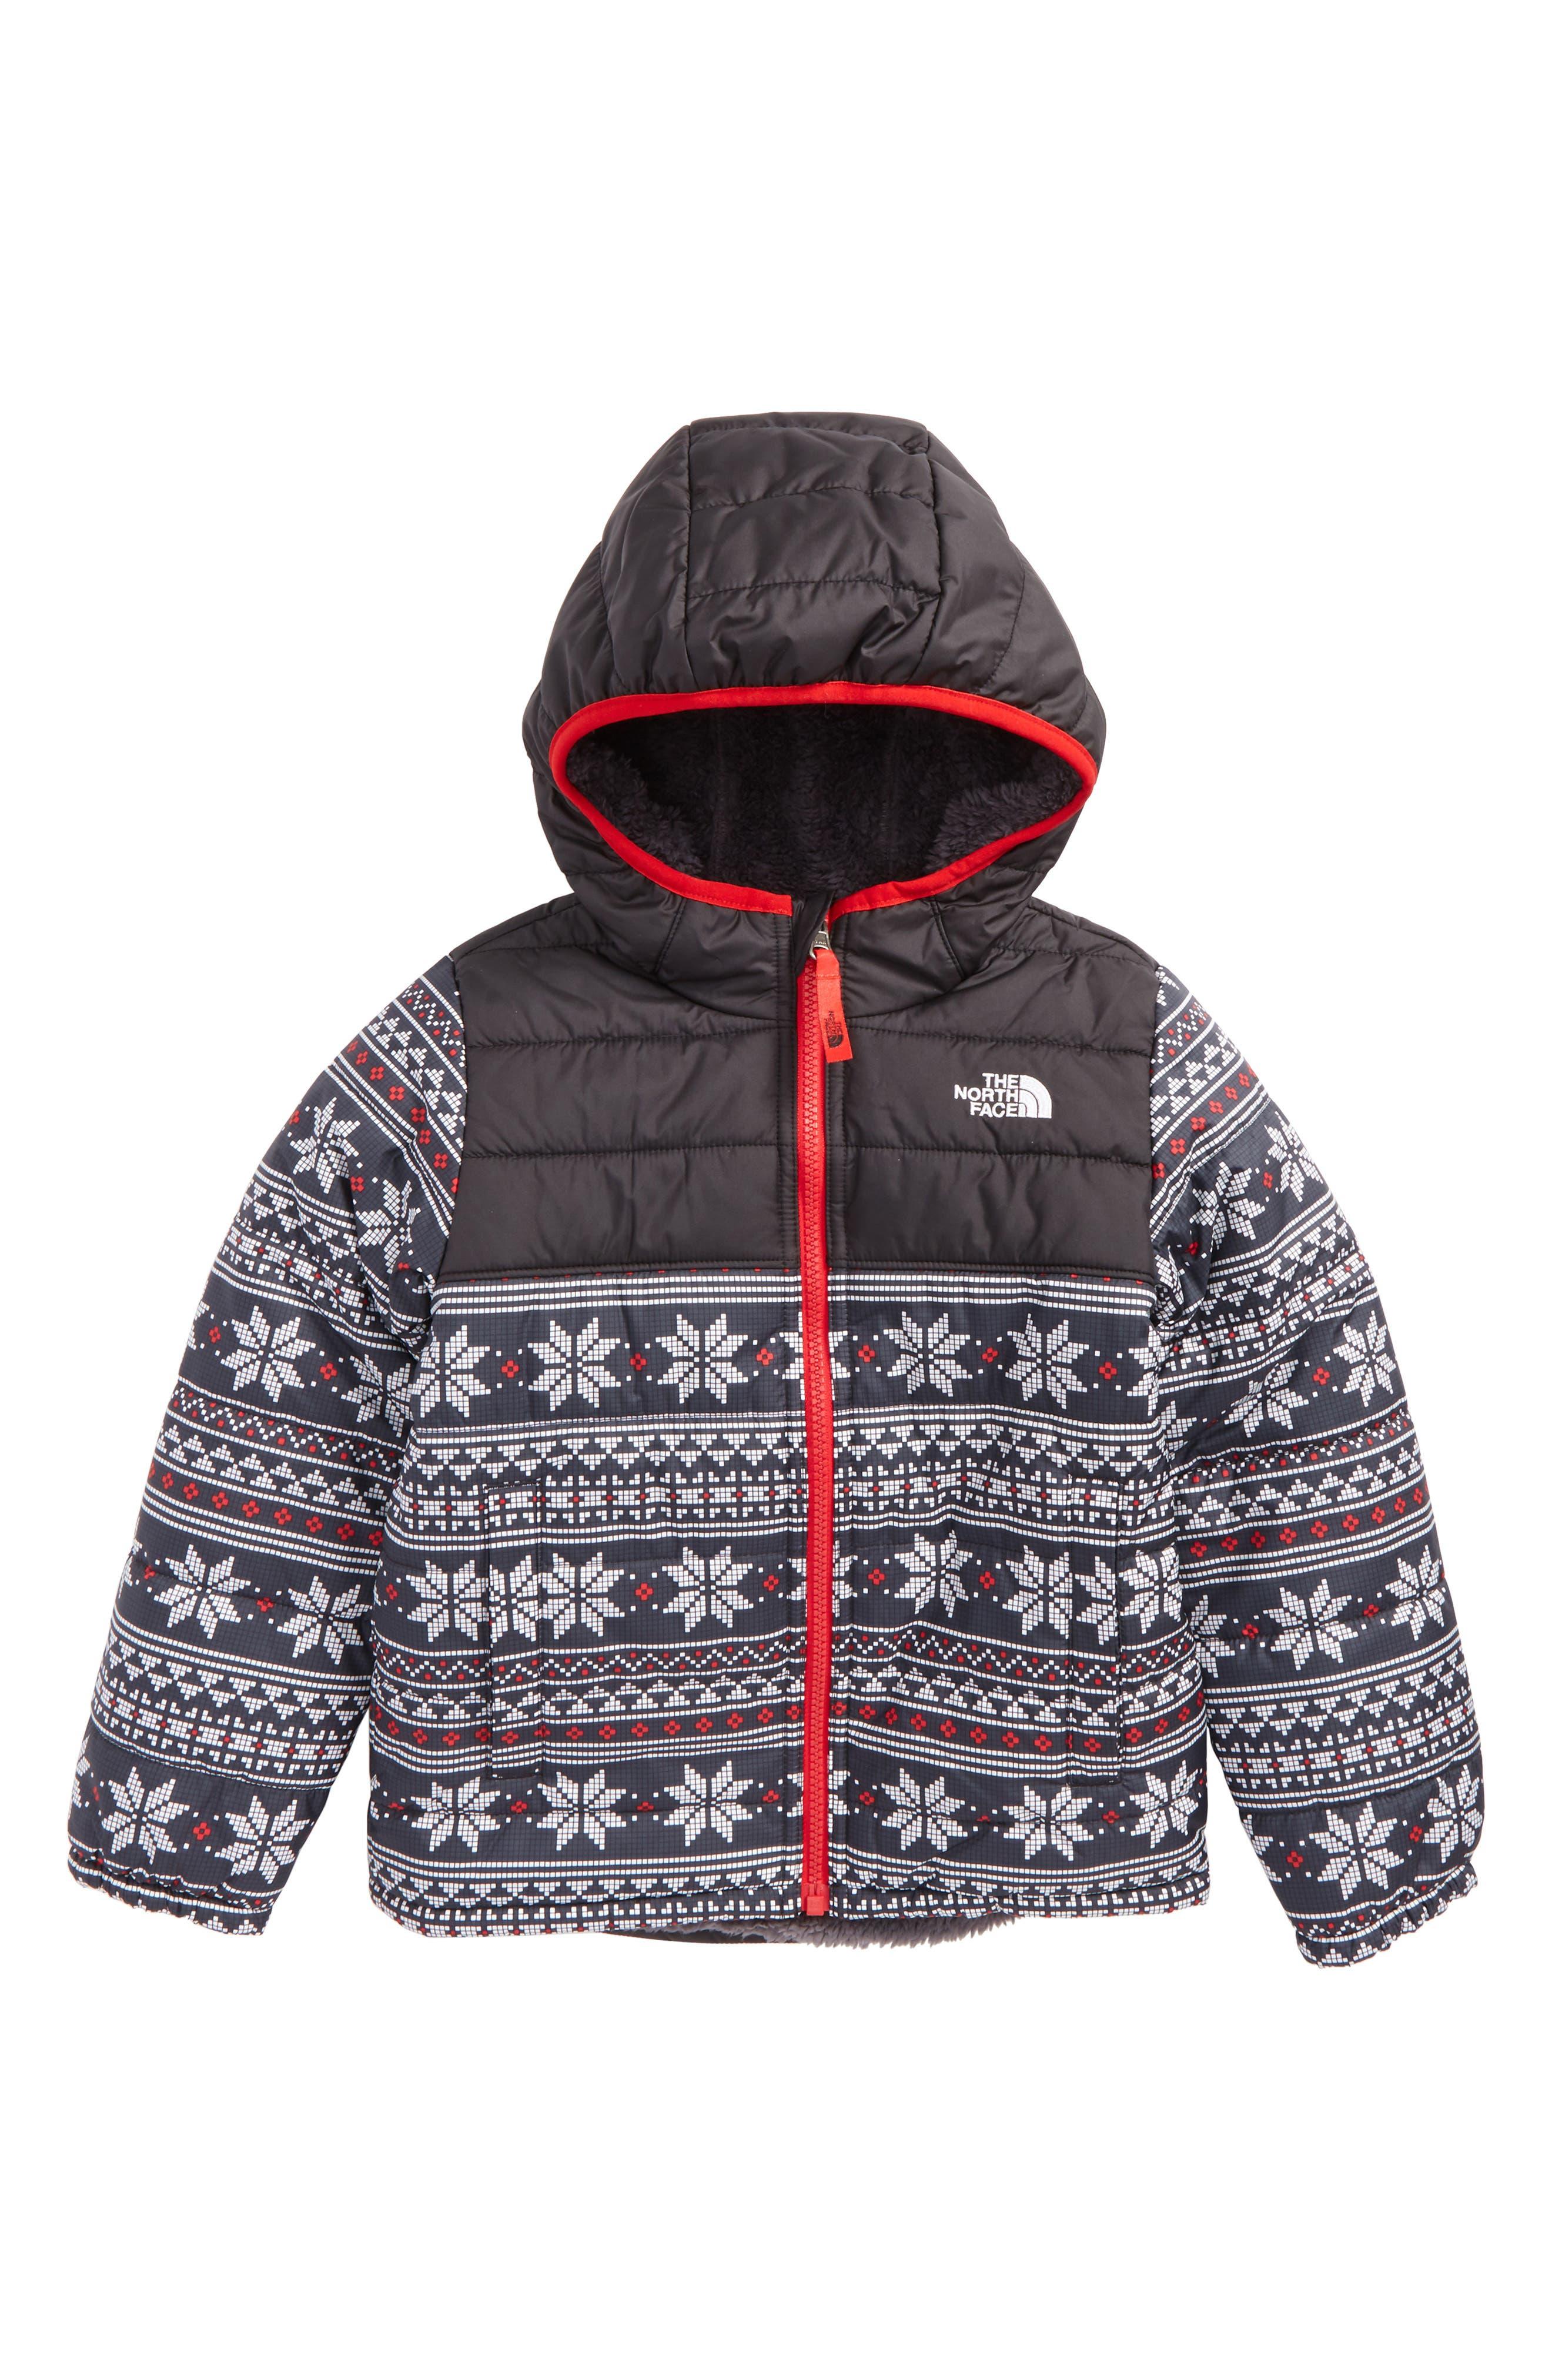 Main Image - The North Face Chimborazo Reversible Jacket (Toddler Boys & Little Boys)